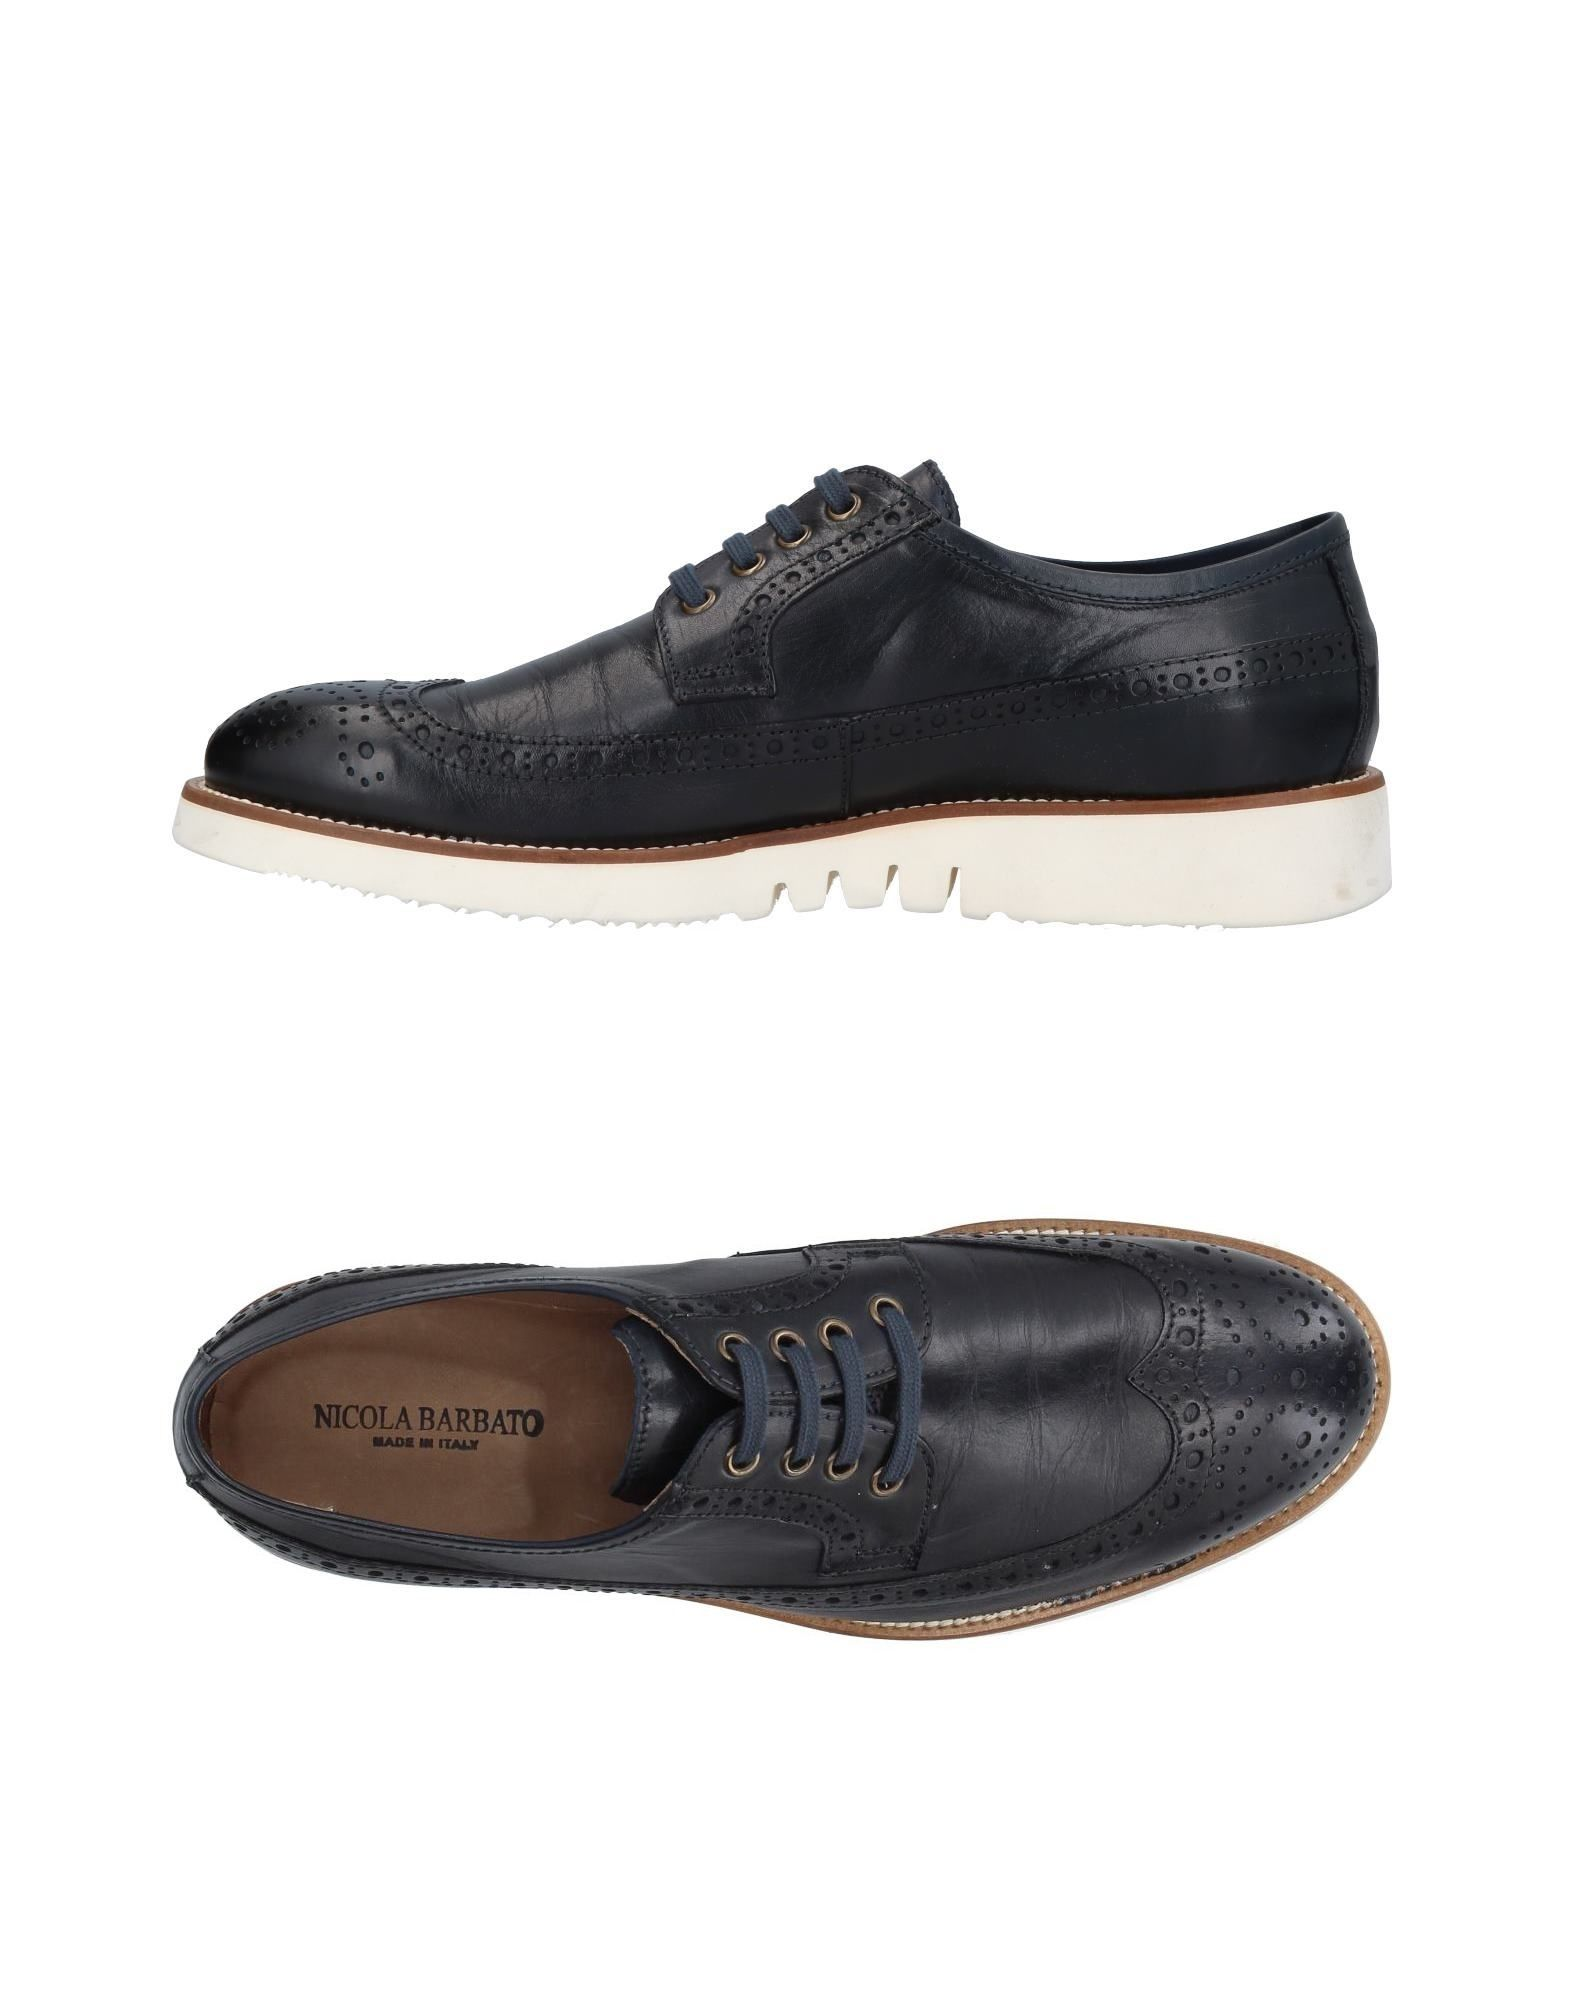 цены на NICOLA BARBATO Обувь на шнурках в интернет-магазинах